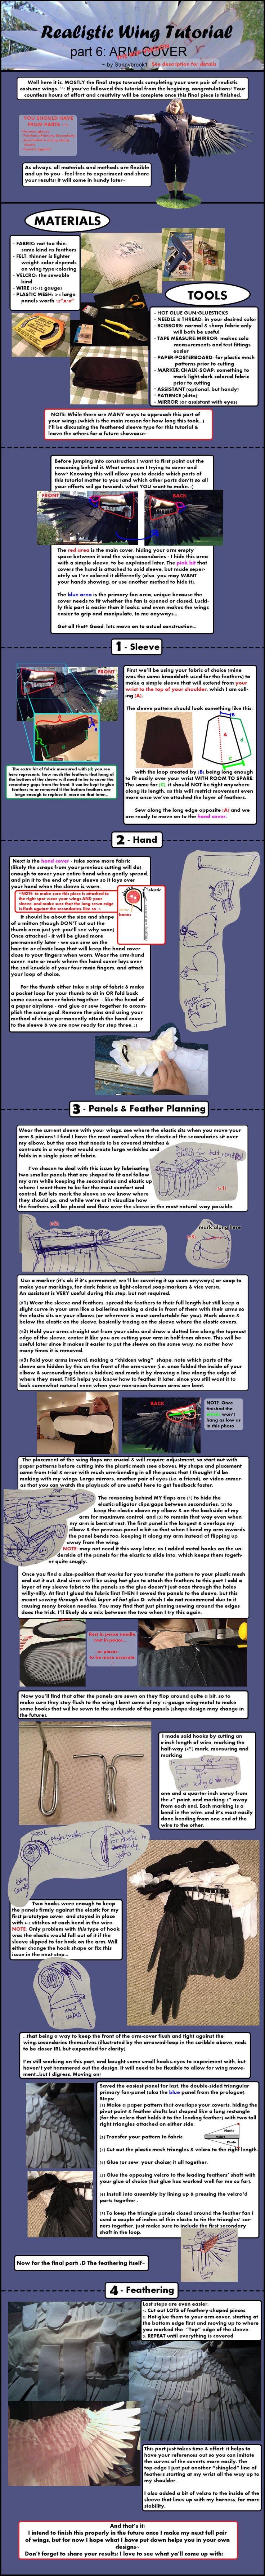 Realistic Wing Tutorial - P.6 WIP by Sunnybrook1.deviantart.com on @DeviantArt